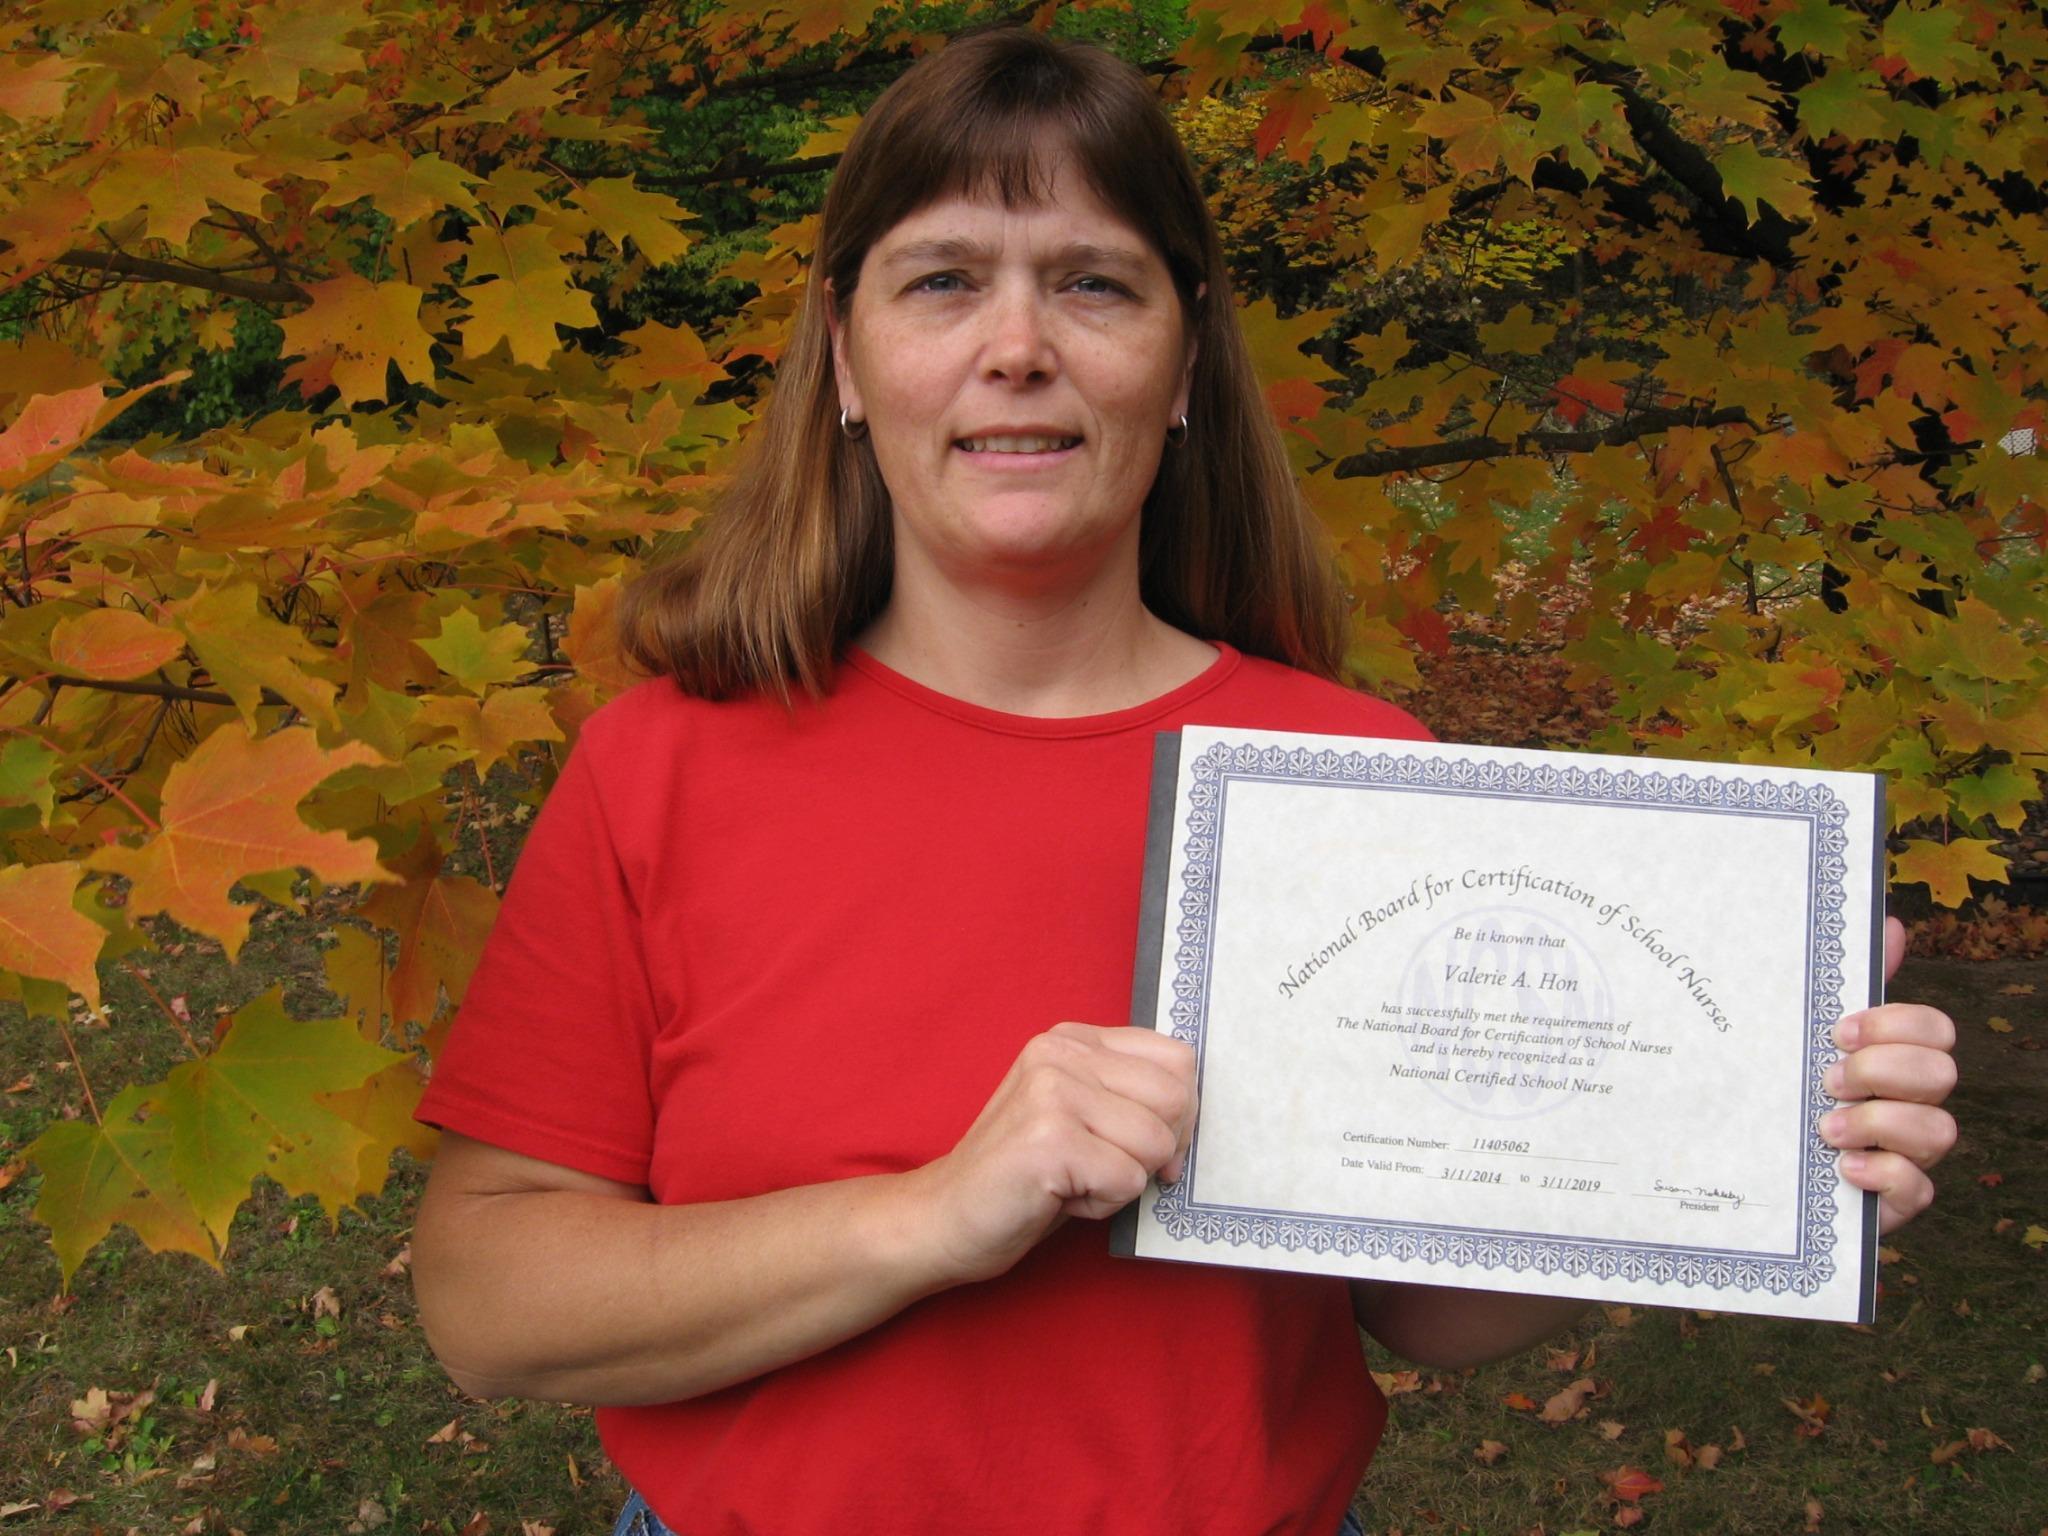 Portage Schools On Twitter Congrats To District Nurse Valerie Hon